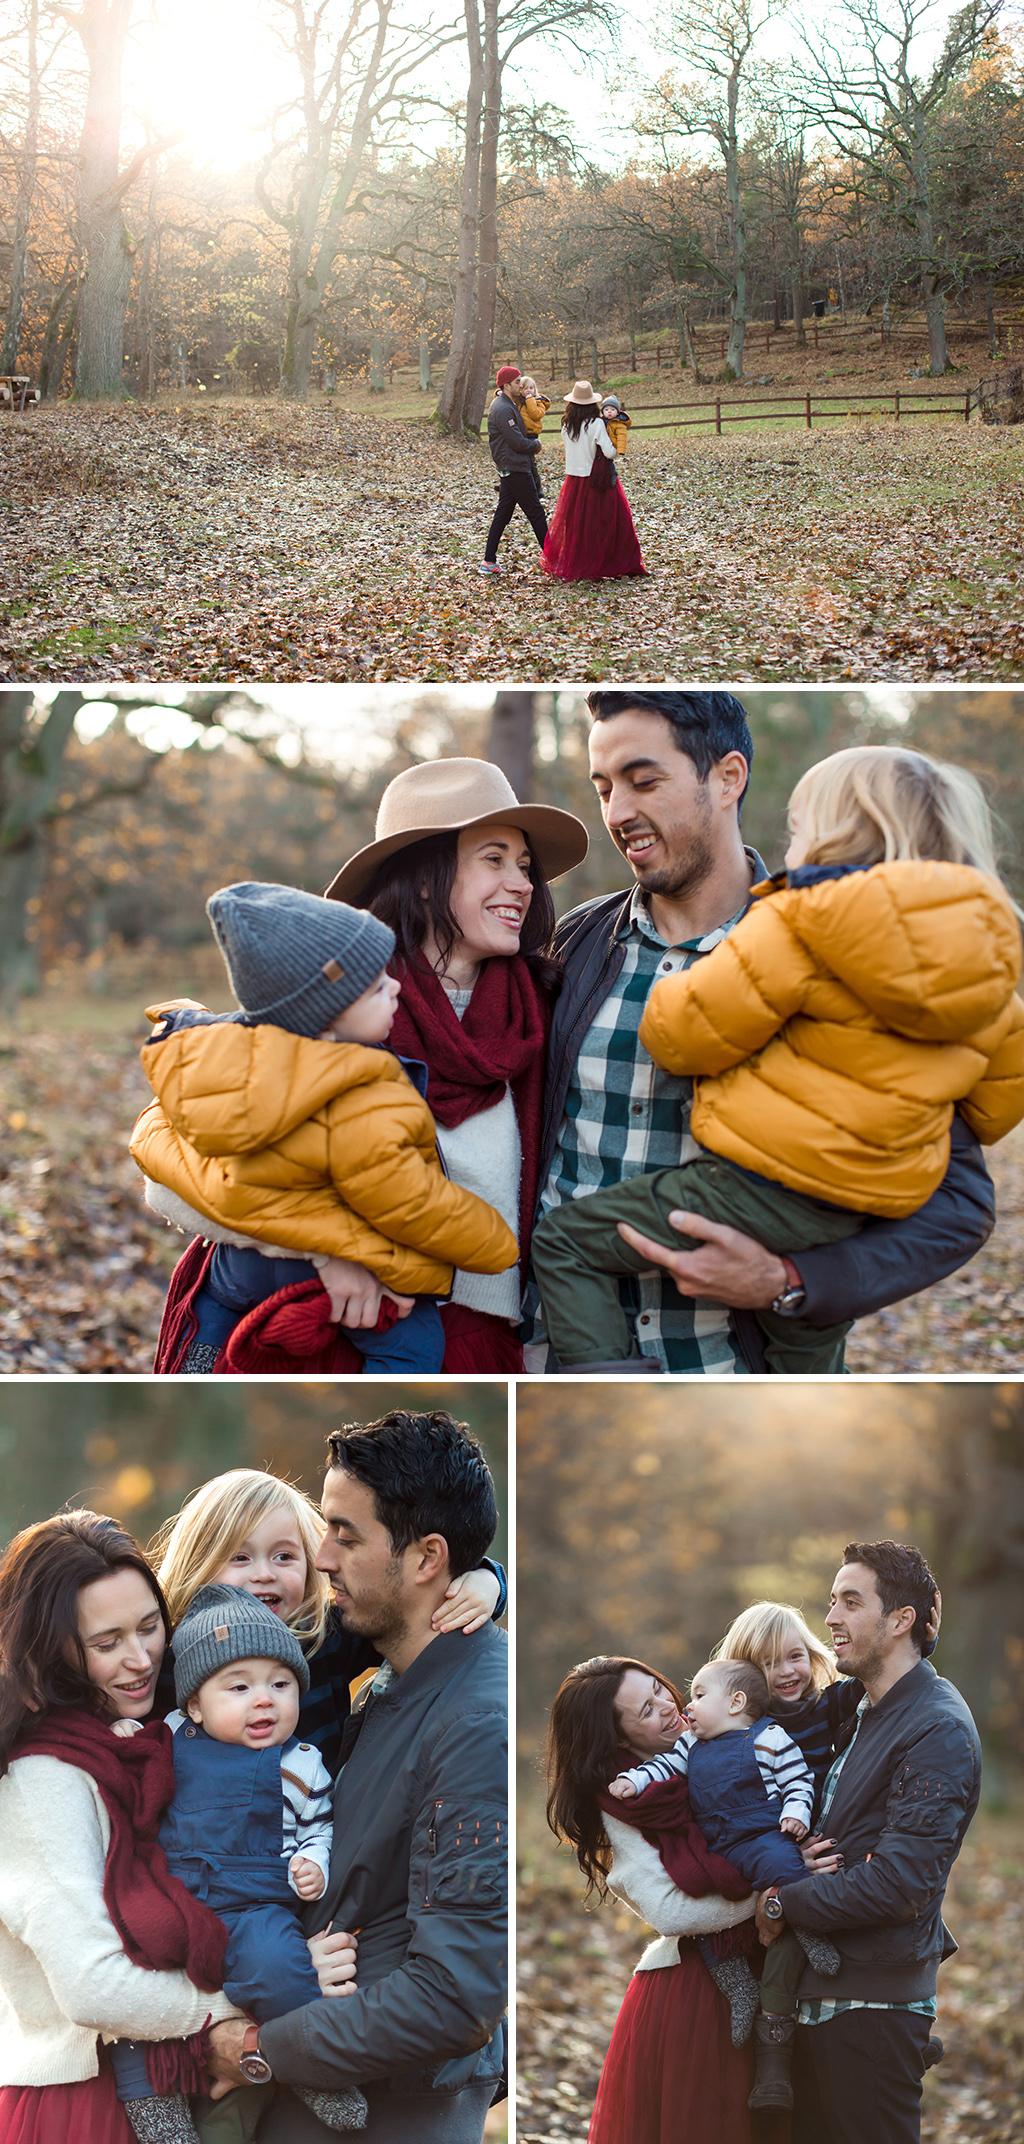 Hostfotografering-i-november-familjefotografering-Stockholm-15.jpg